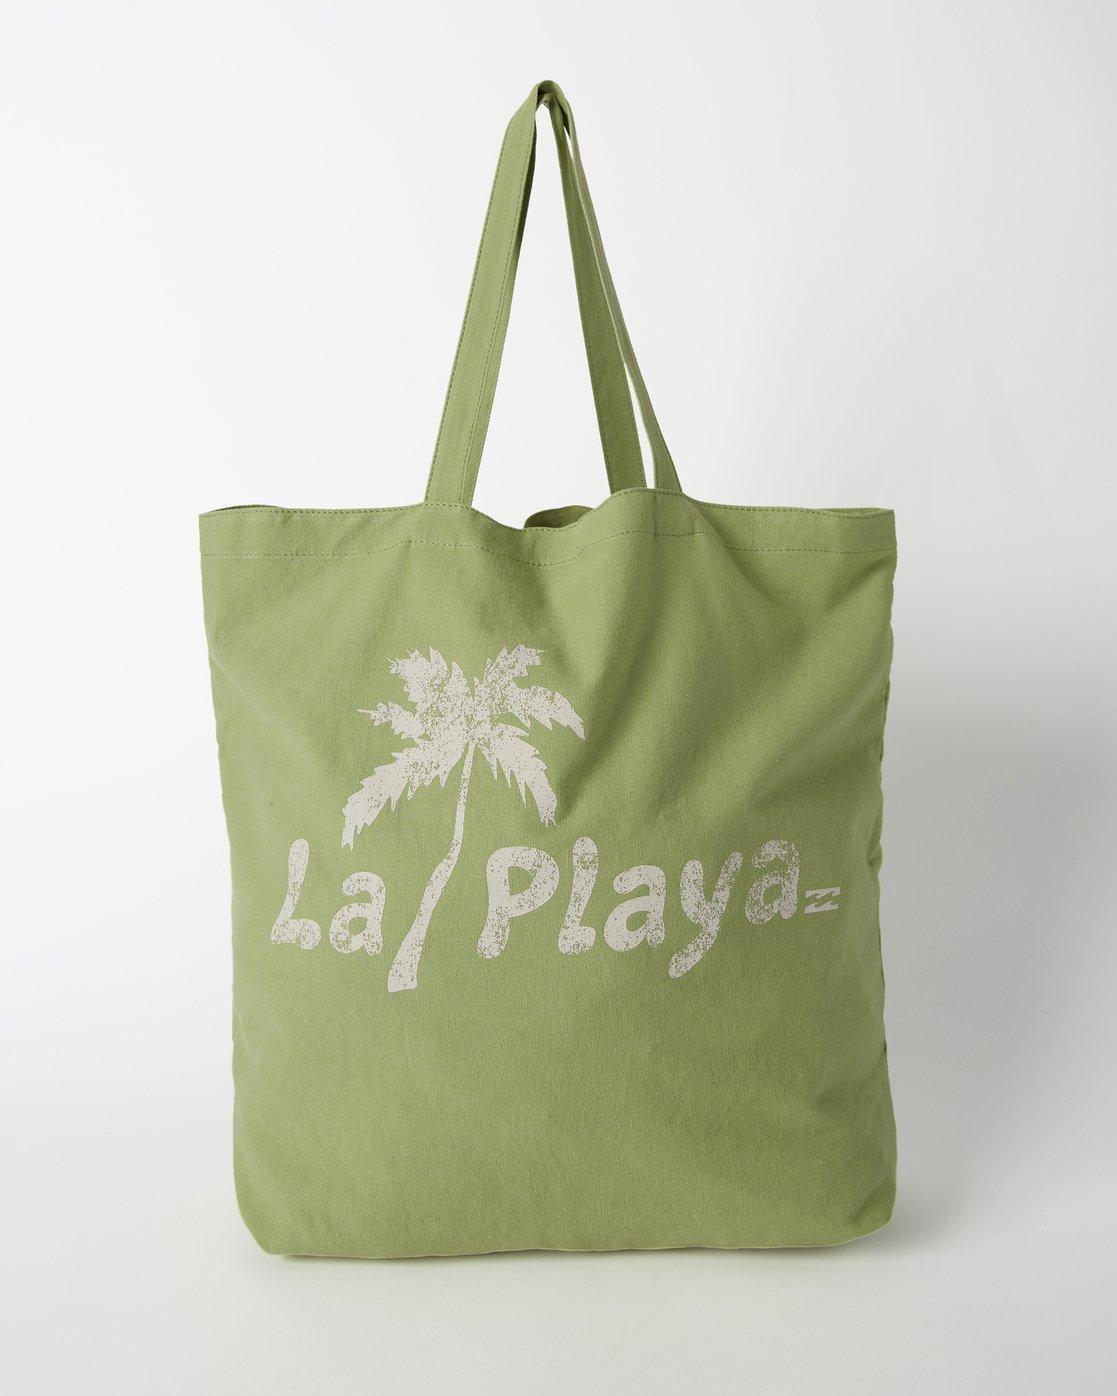 Market bag beach bag swim bag more colors available !